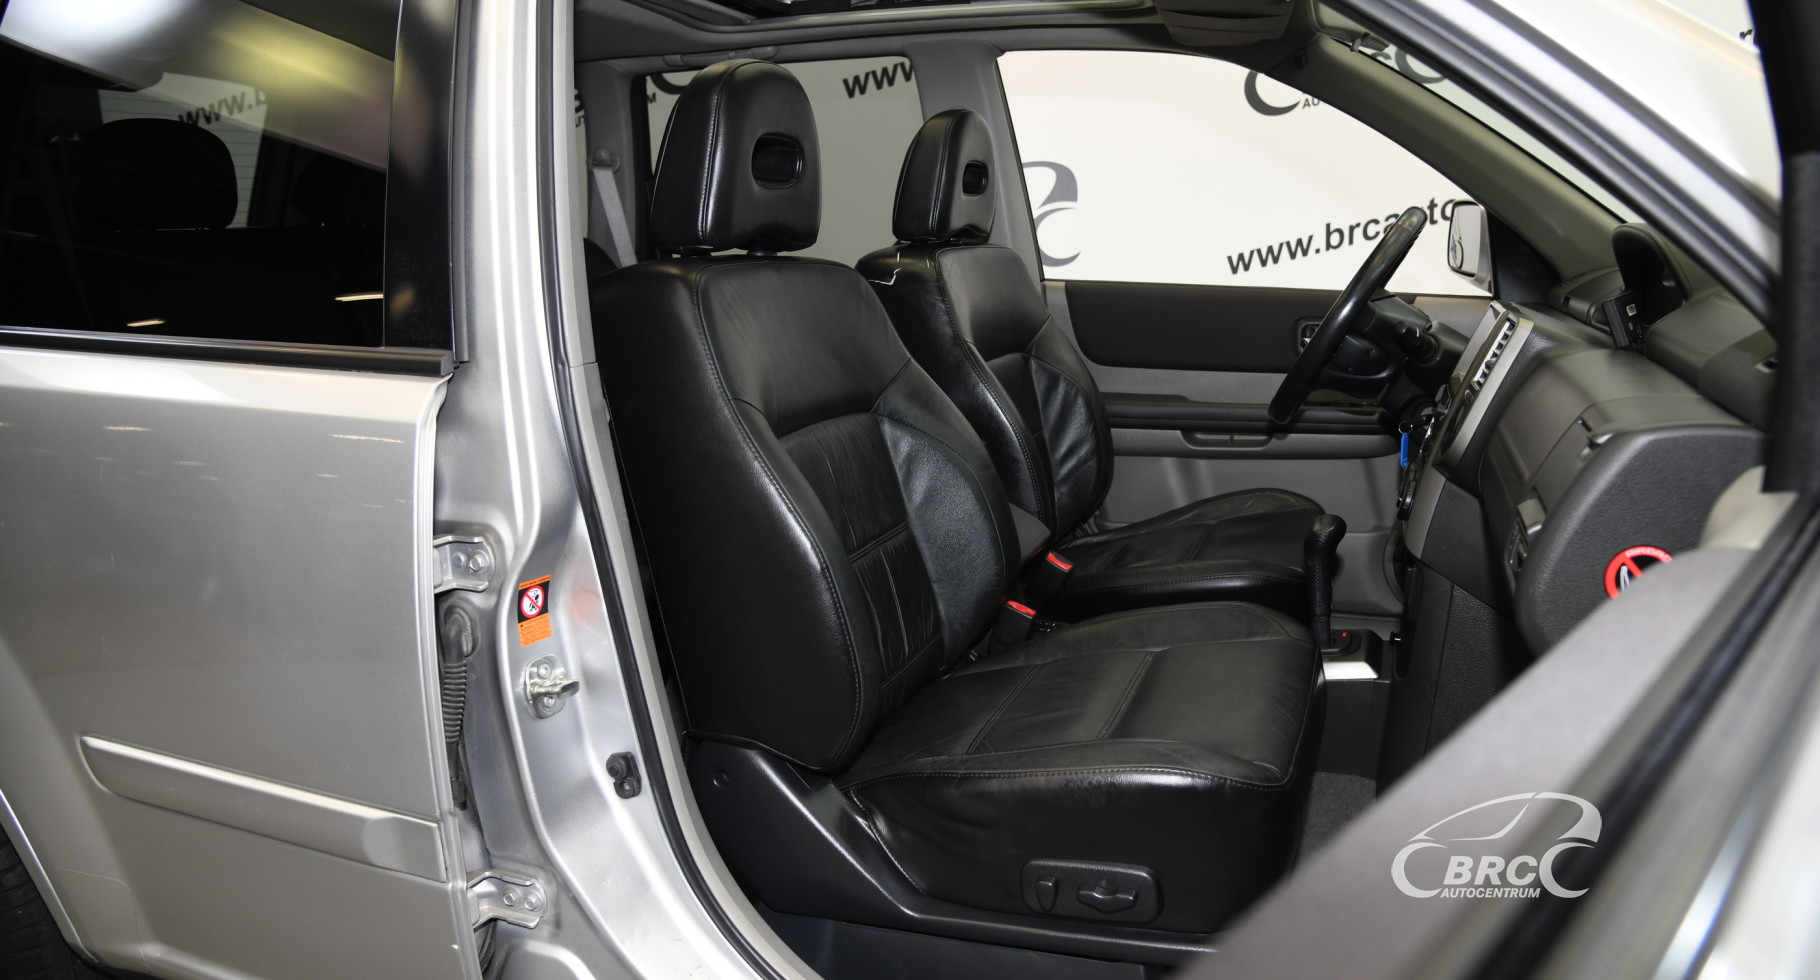 Nissan X-Trail 2.4i 4x4 Automatas